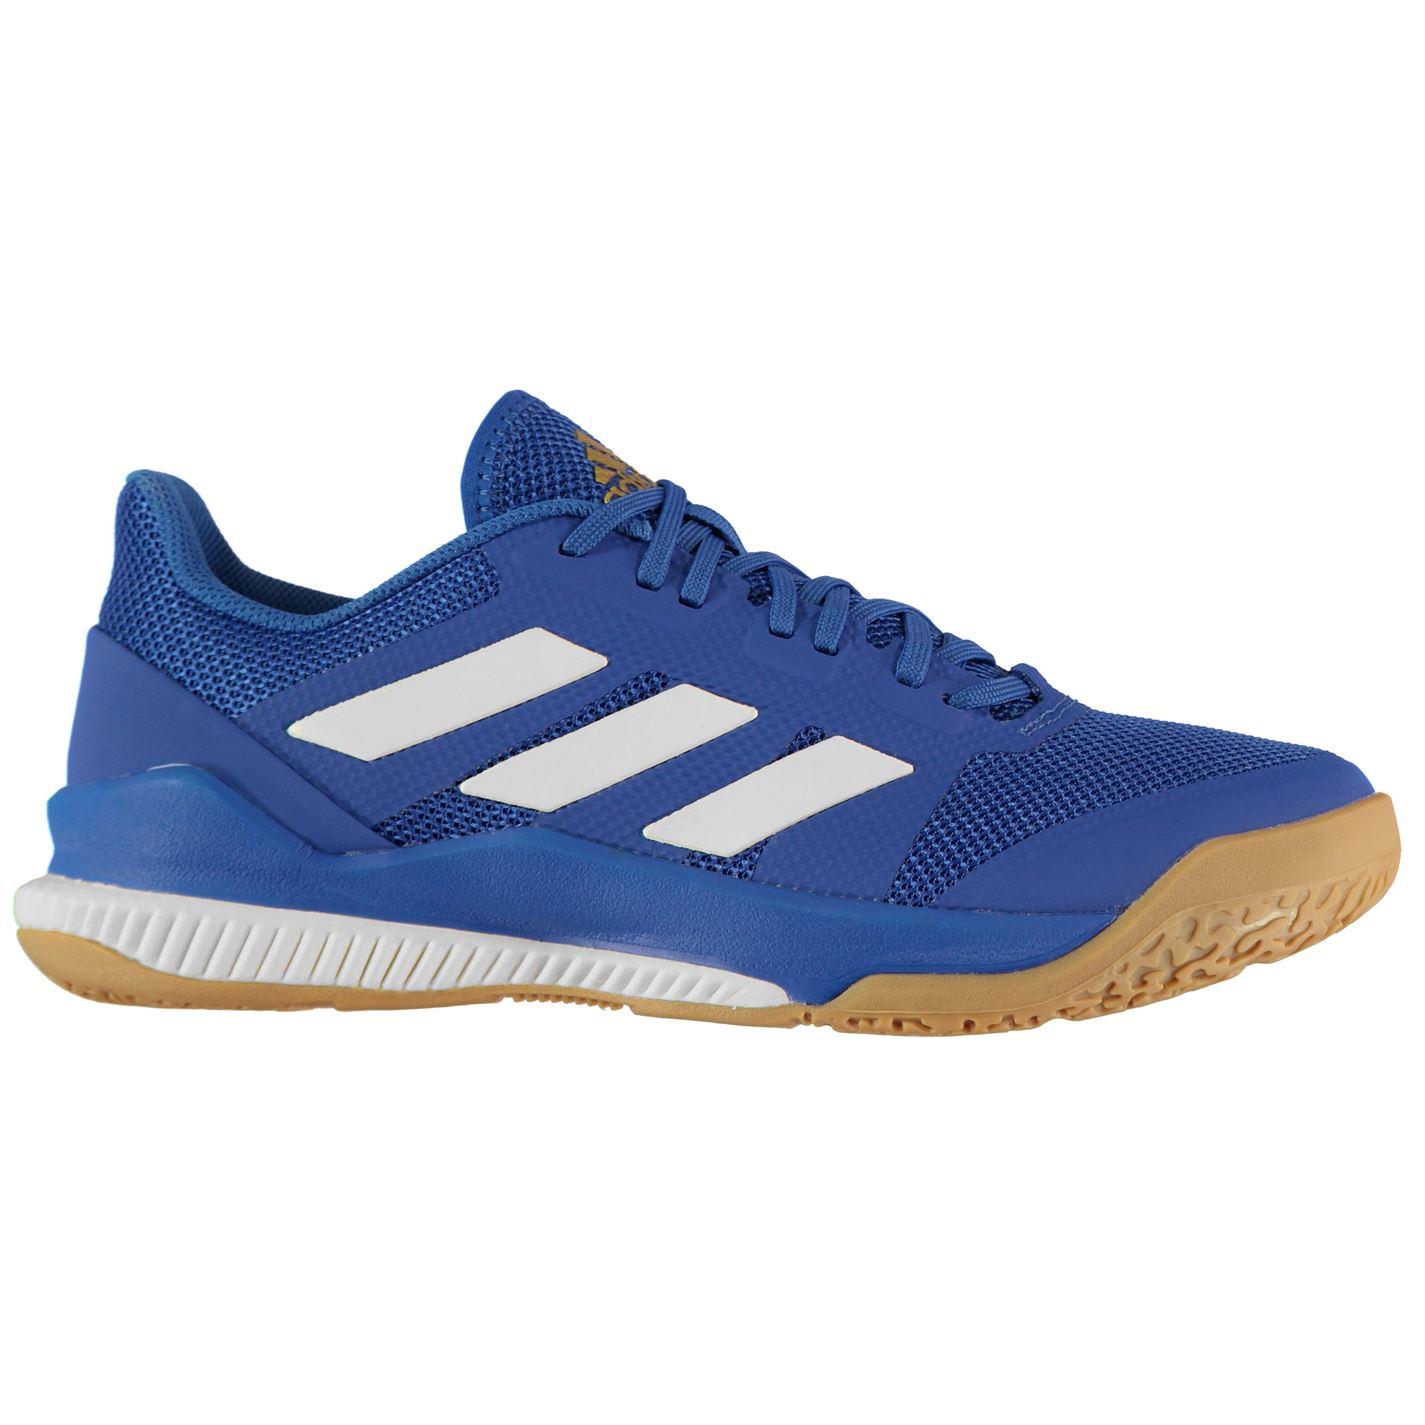 Adidas Stabil Bounce Sn01